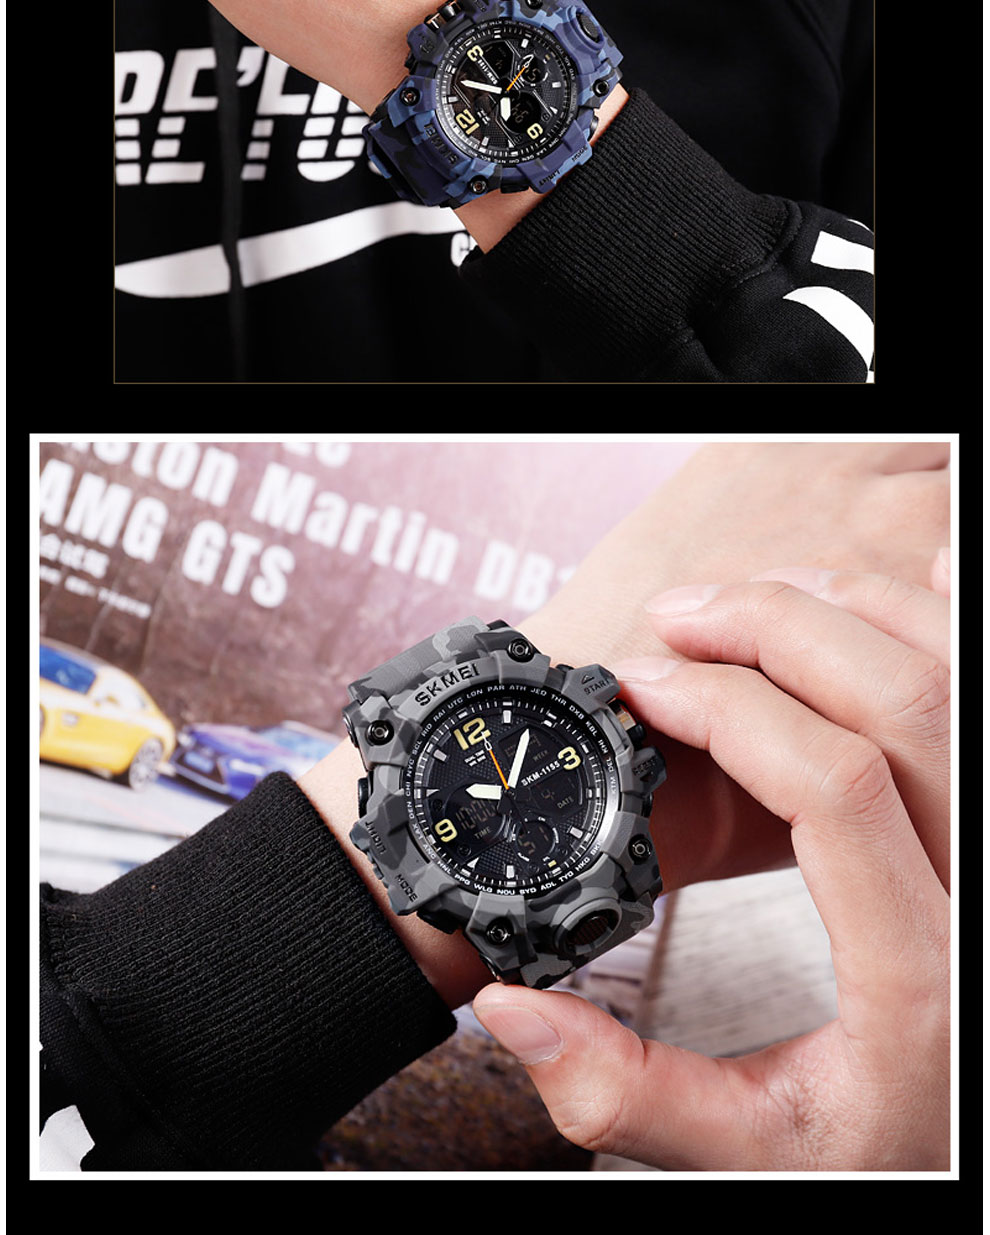 HTB1Li8CRsfpK1RjSZFOq6y6nFXaa SKMEI Brand Luxury Military Sports Watches Men Quartz Analog LED Digital Clock Man Waterproof Dual Display Wristwatches Relogio